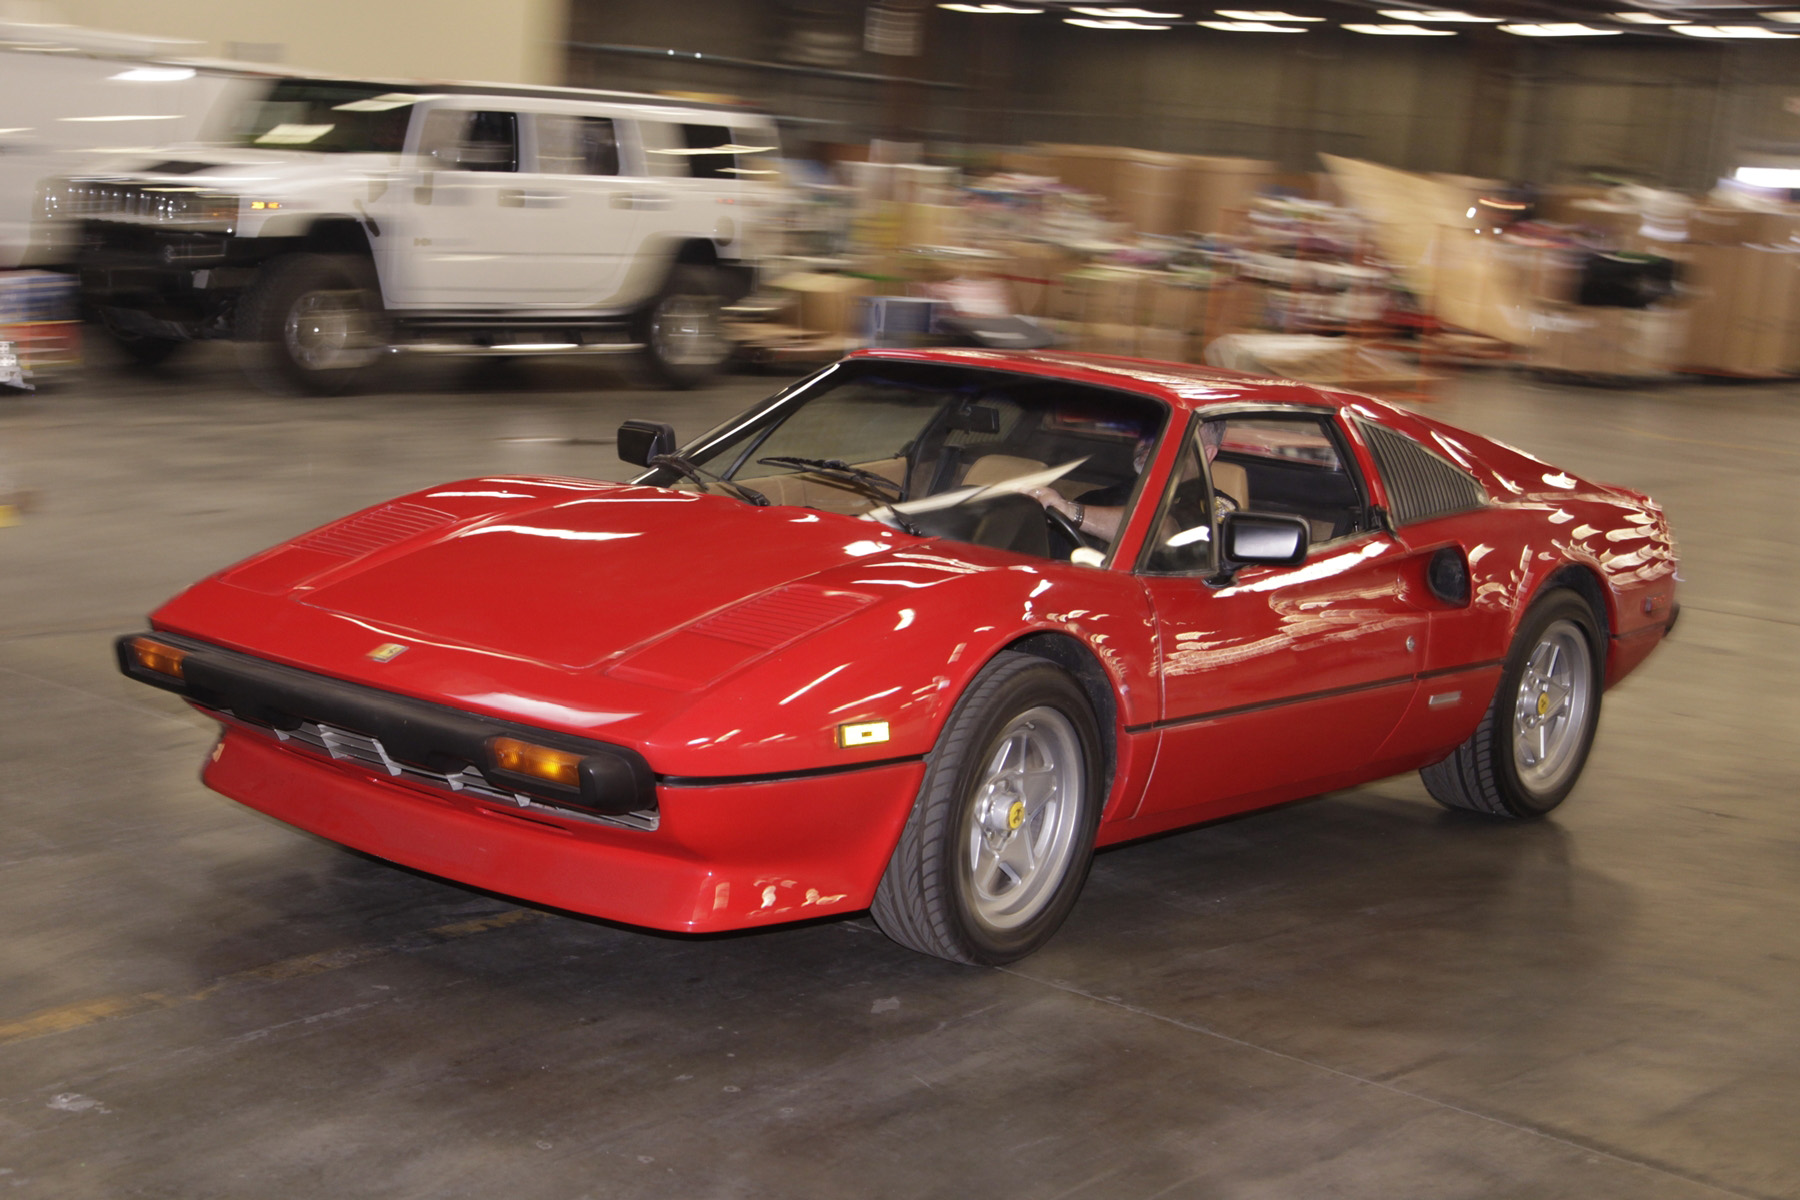 A California Highway Patrol Officer drives the stolen 1981 Ferrari at the Port of LA/Long Beach Customs warehouse.